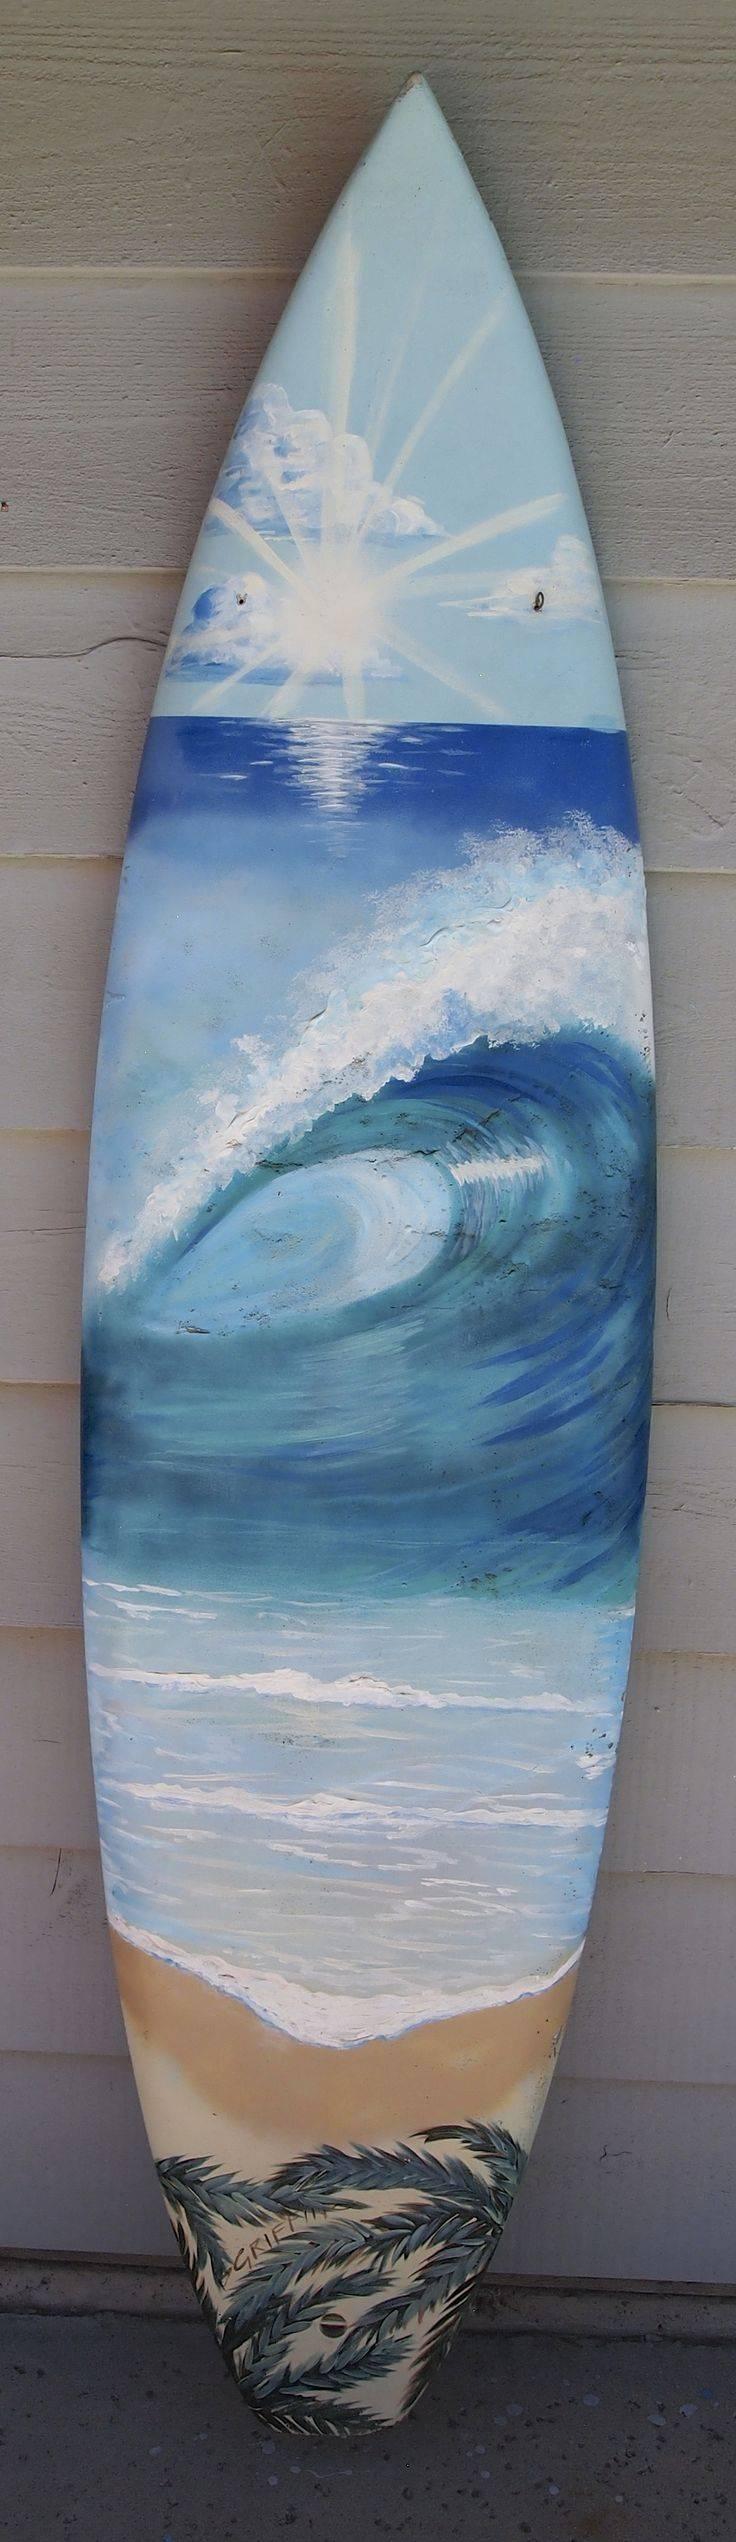 Best 25+ Surfboard Decor Ideas On Pinterest | Used Surfboards With Best And Newest Decorative Surfboard Wall Art (View 16 of 25)